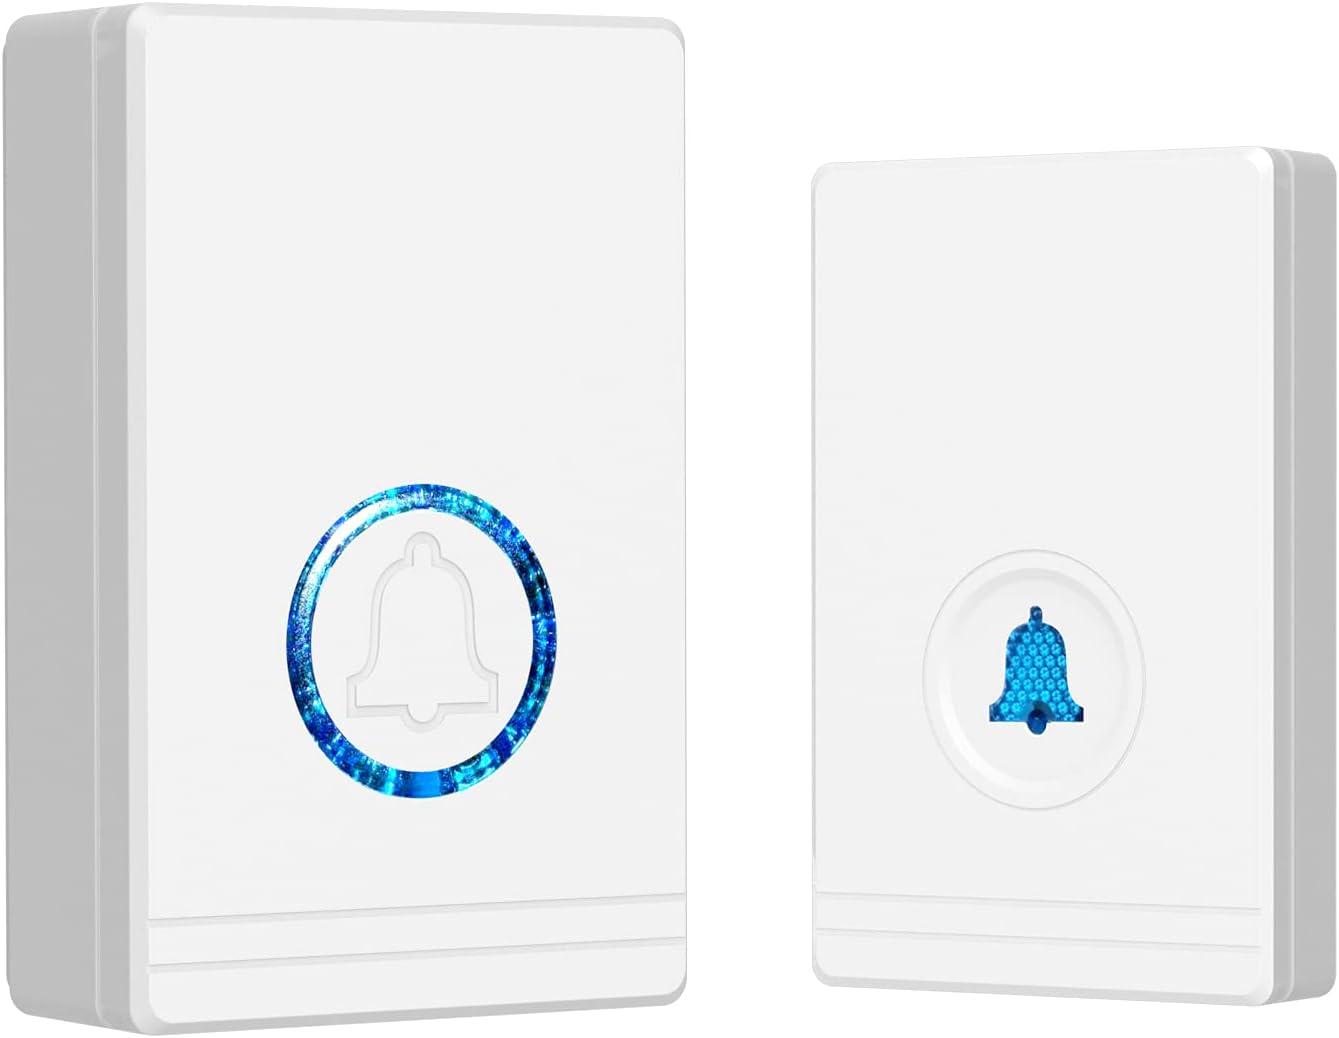 Wireless Door Chime Waterproof Doorbell Mini Cordless Doorbells Kits with 1300-ft Range 48 Ringtones 5 Volume Levels & LED Flash for Home Office, White